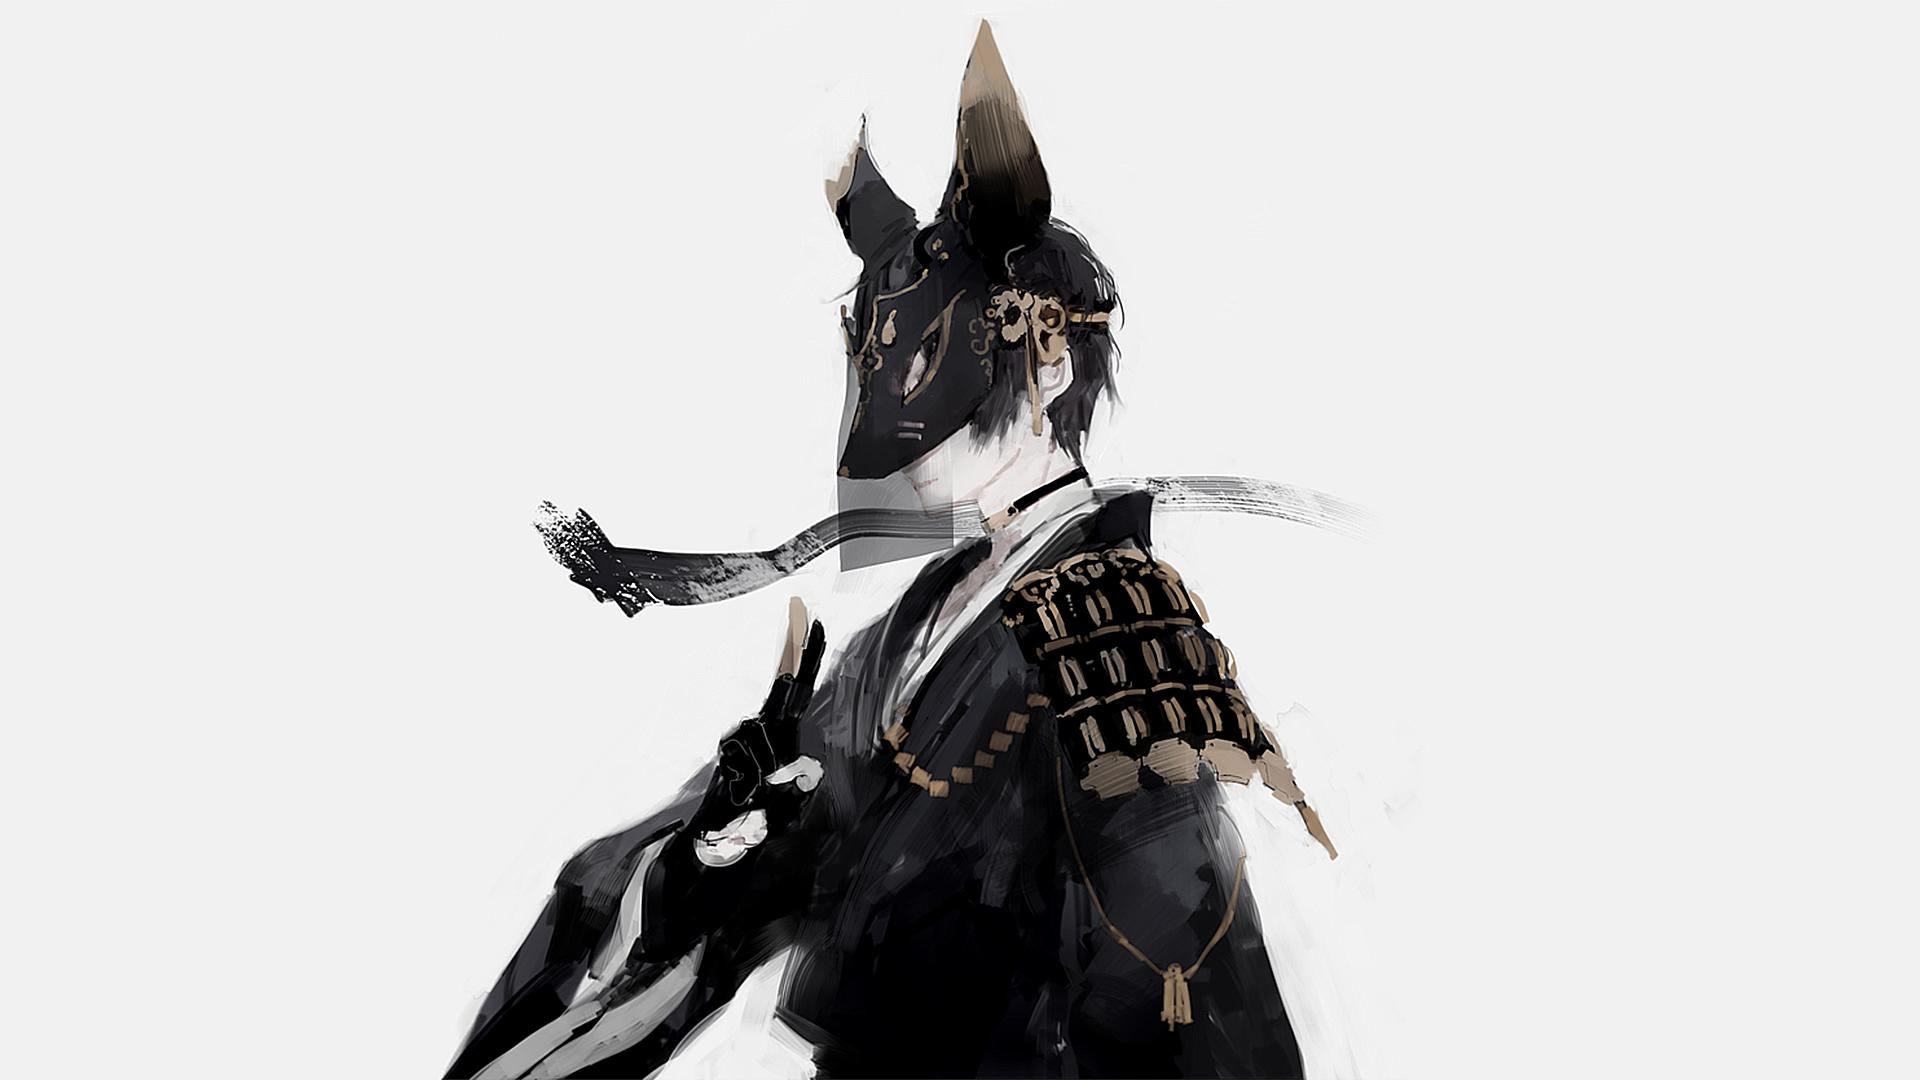 Black Fox, HQ Backgrounds ศิลปะคาแรคเตอร์, การวาด